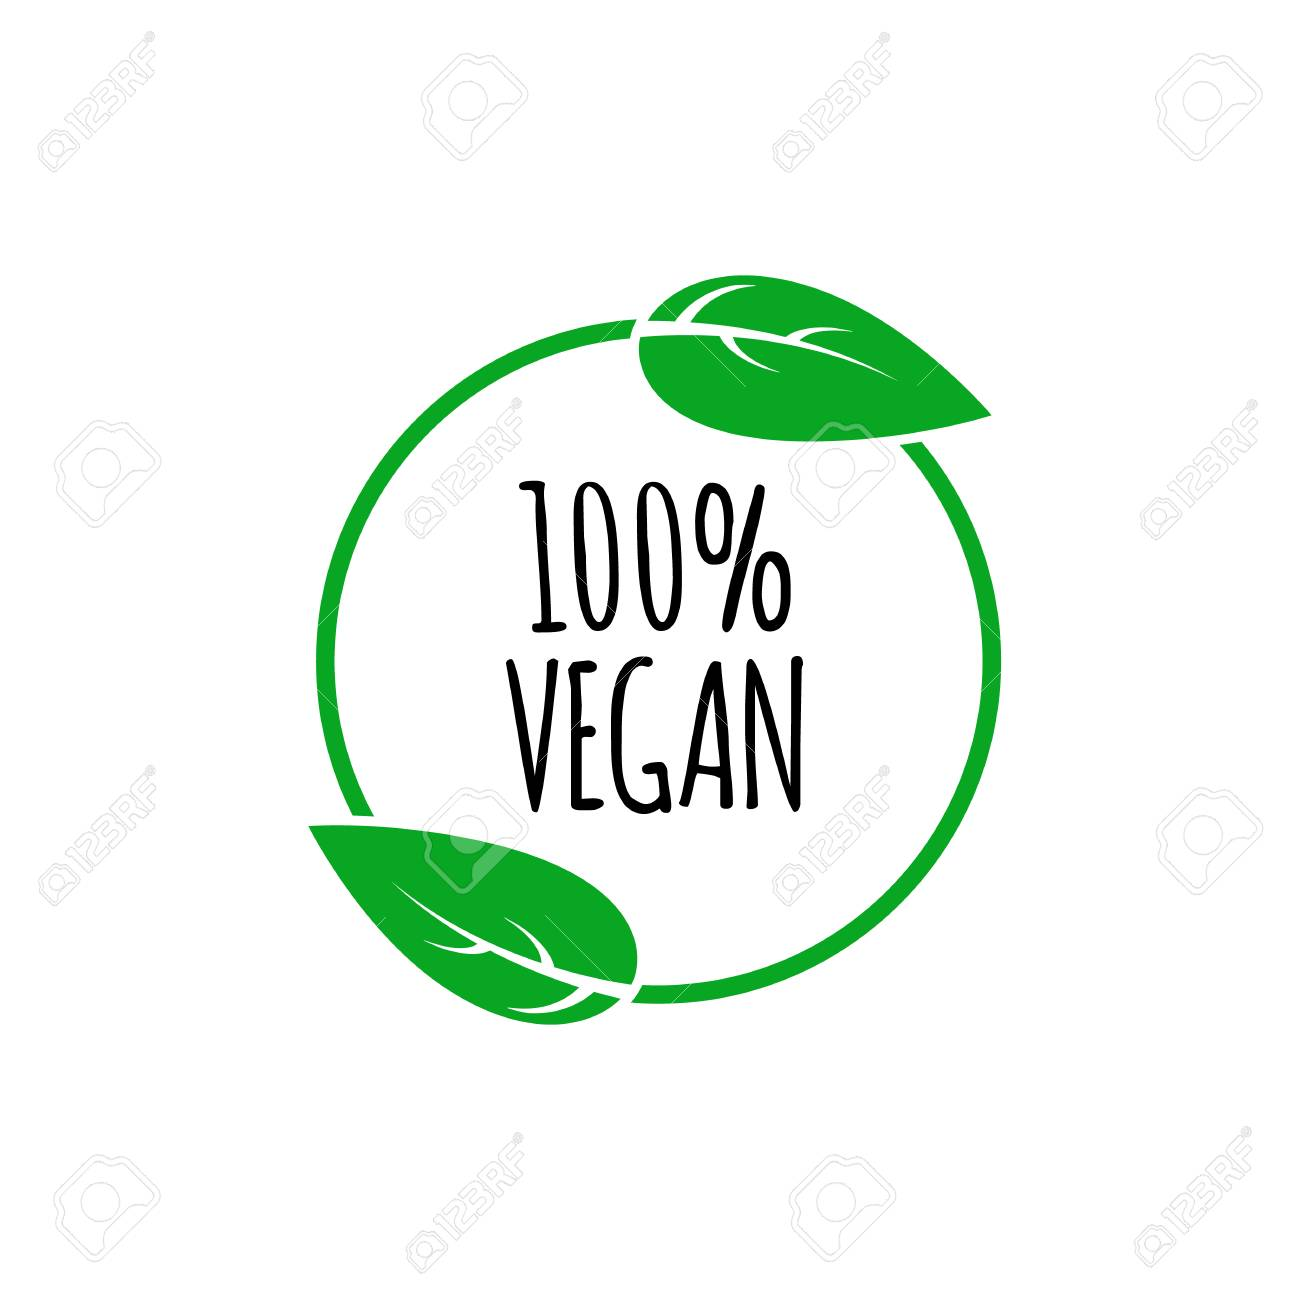 Round vegan, eco, bio green icon with leaf